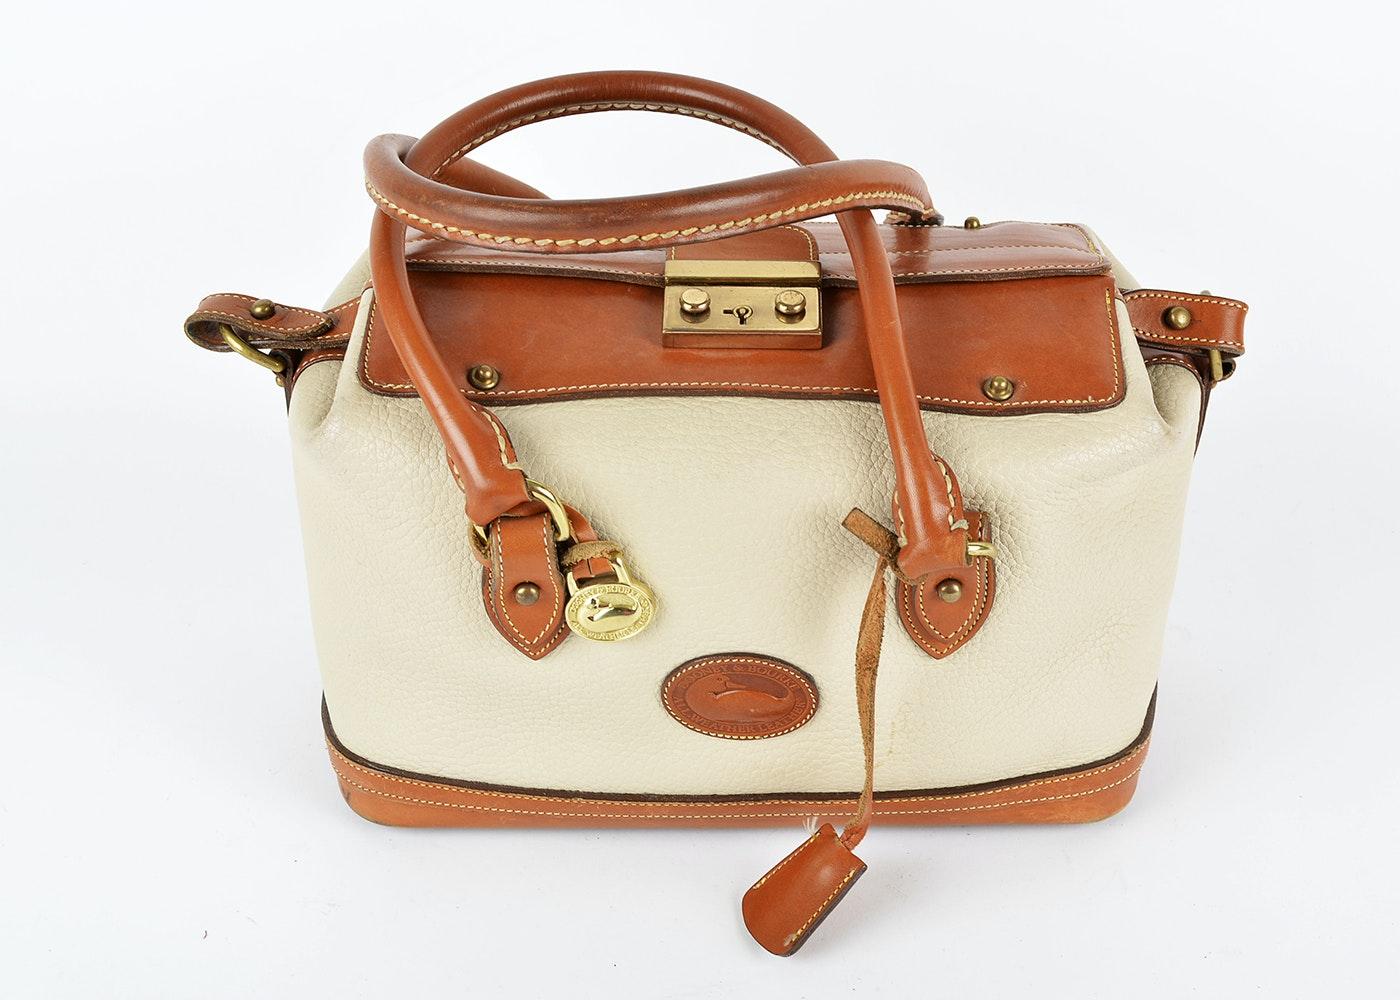 designer purse sale zn4e  Dooney & Bourke Tan Leather Doctor's Handbag